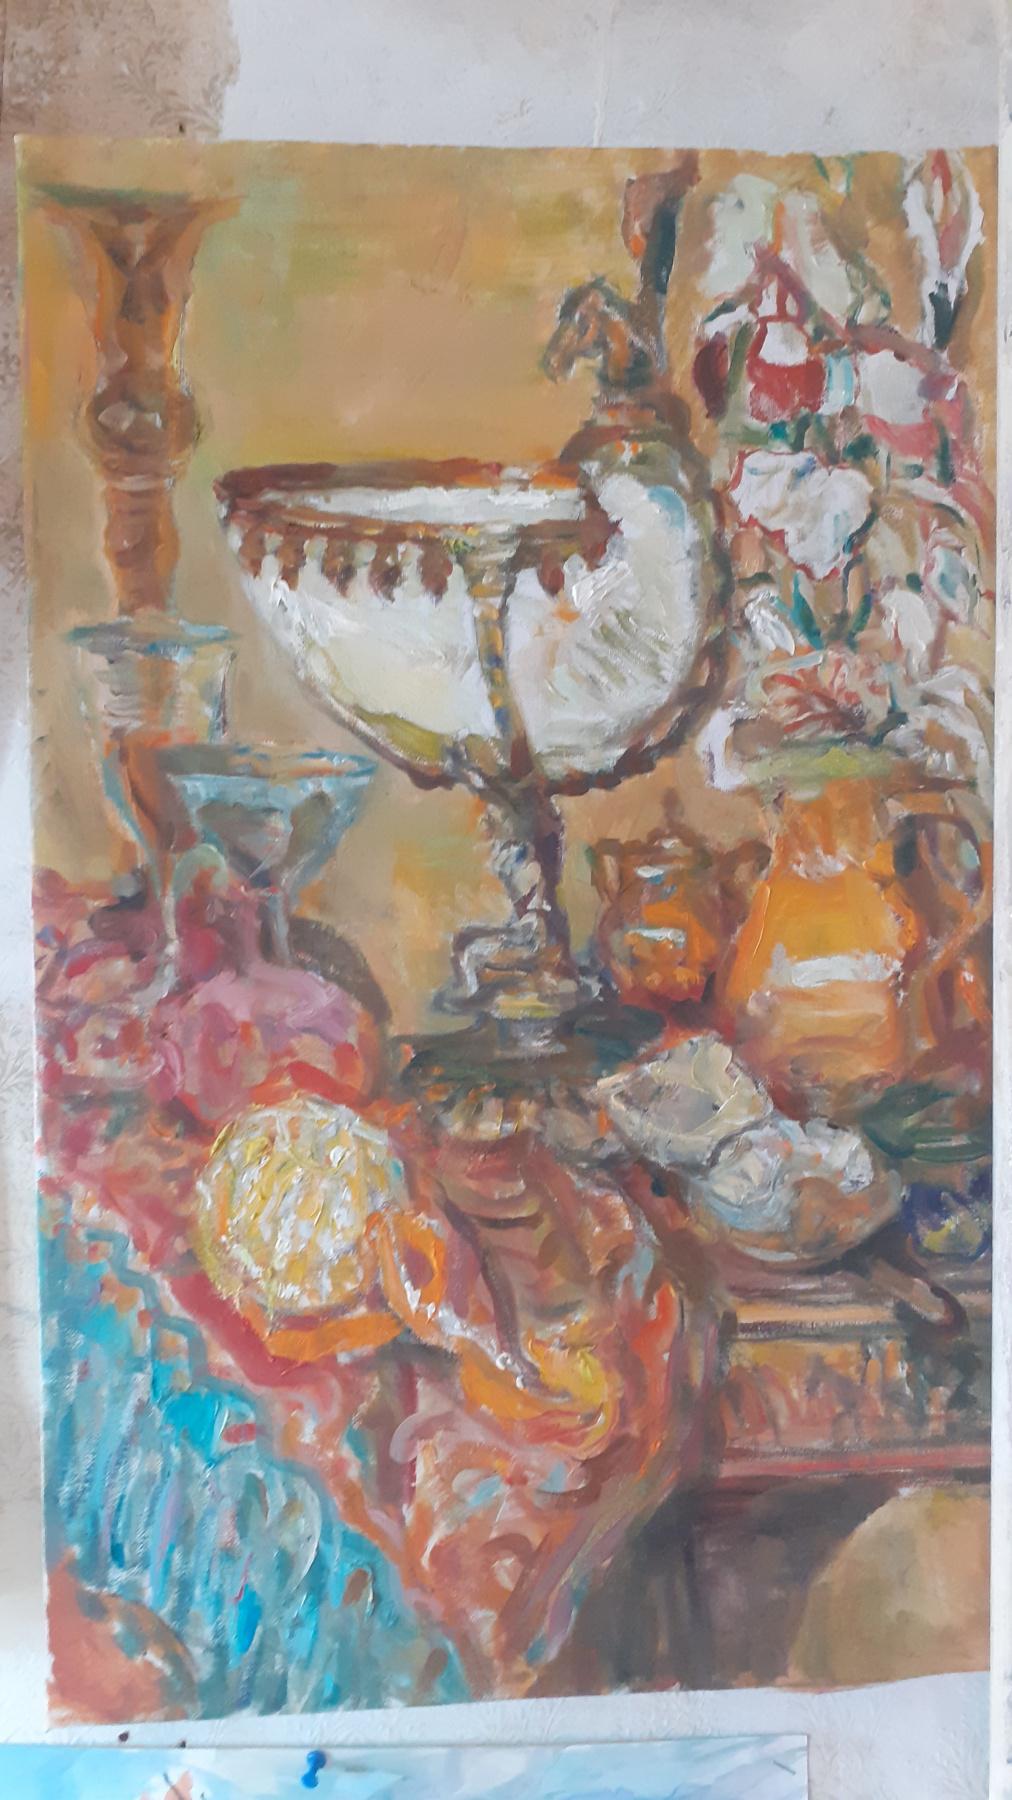 Igor Siemen. Still life with a bowl of sea shell